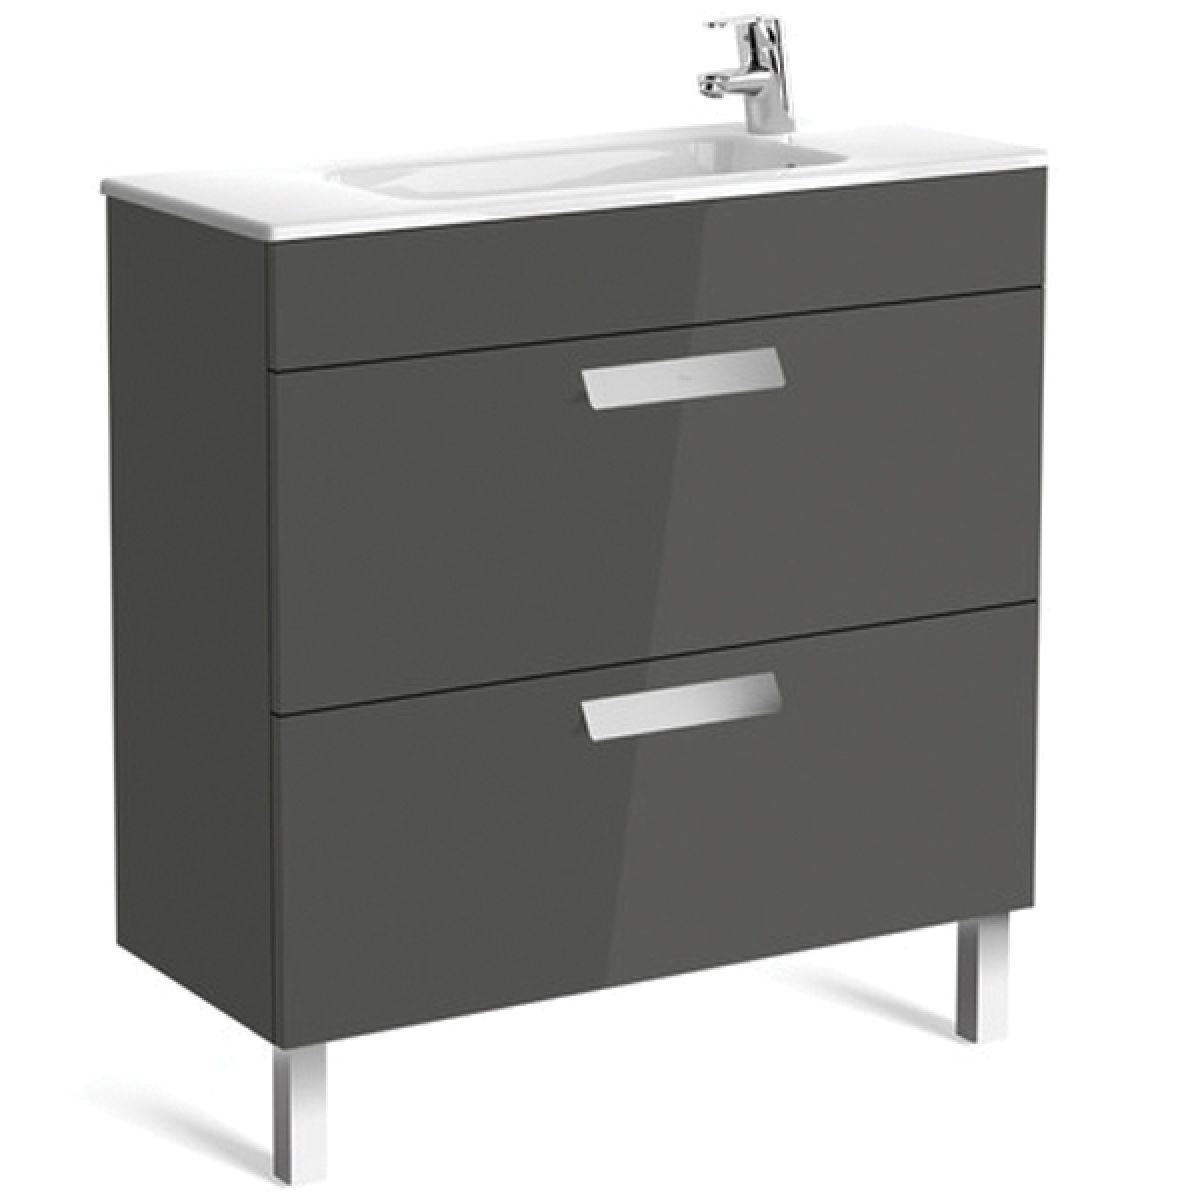 Roca Debba Compact 10 Drawer Vanity Unit with basin : UK Bathrooms